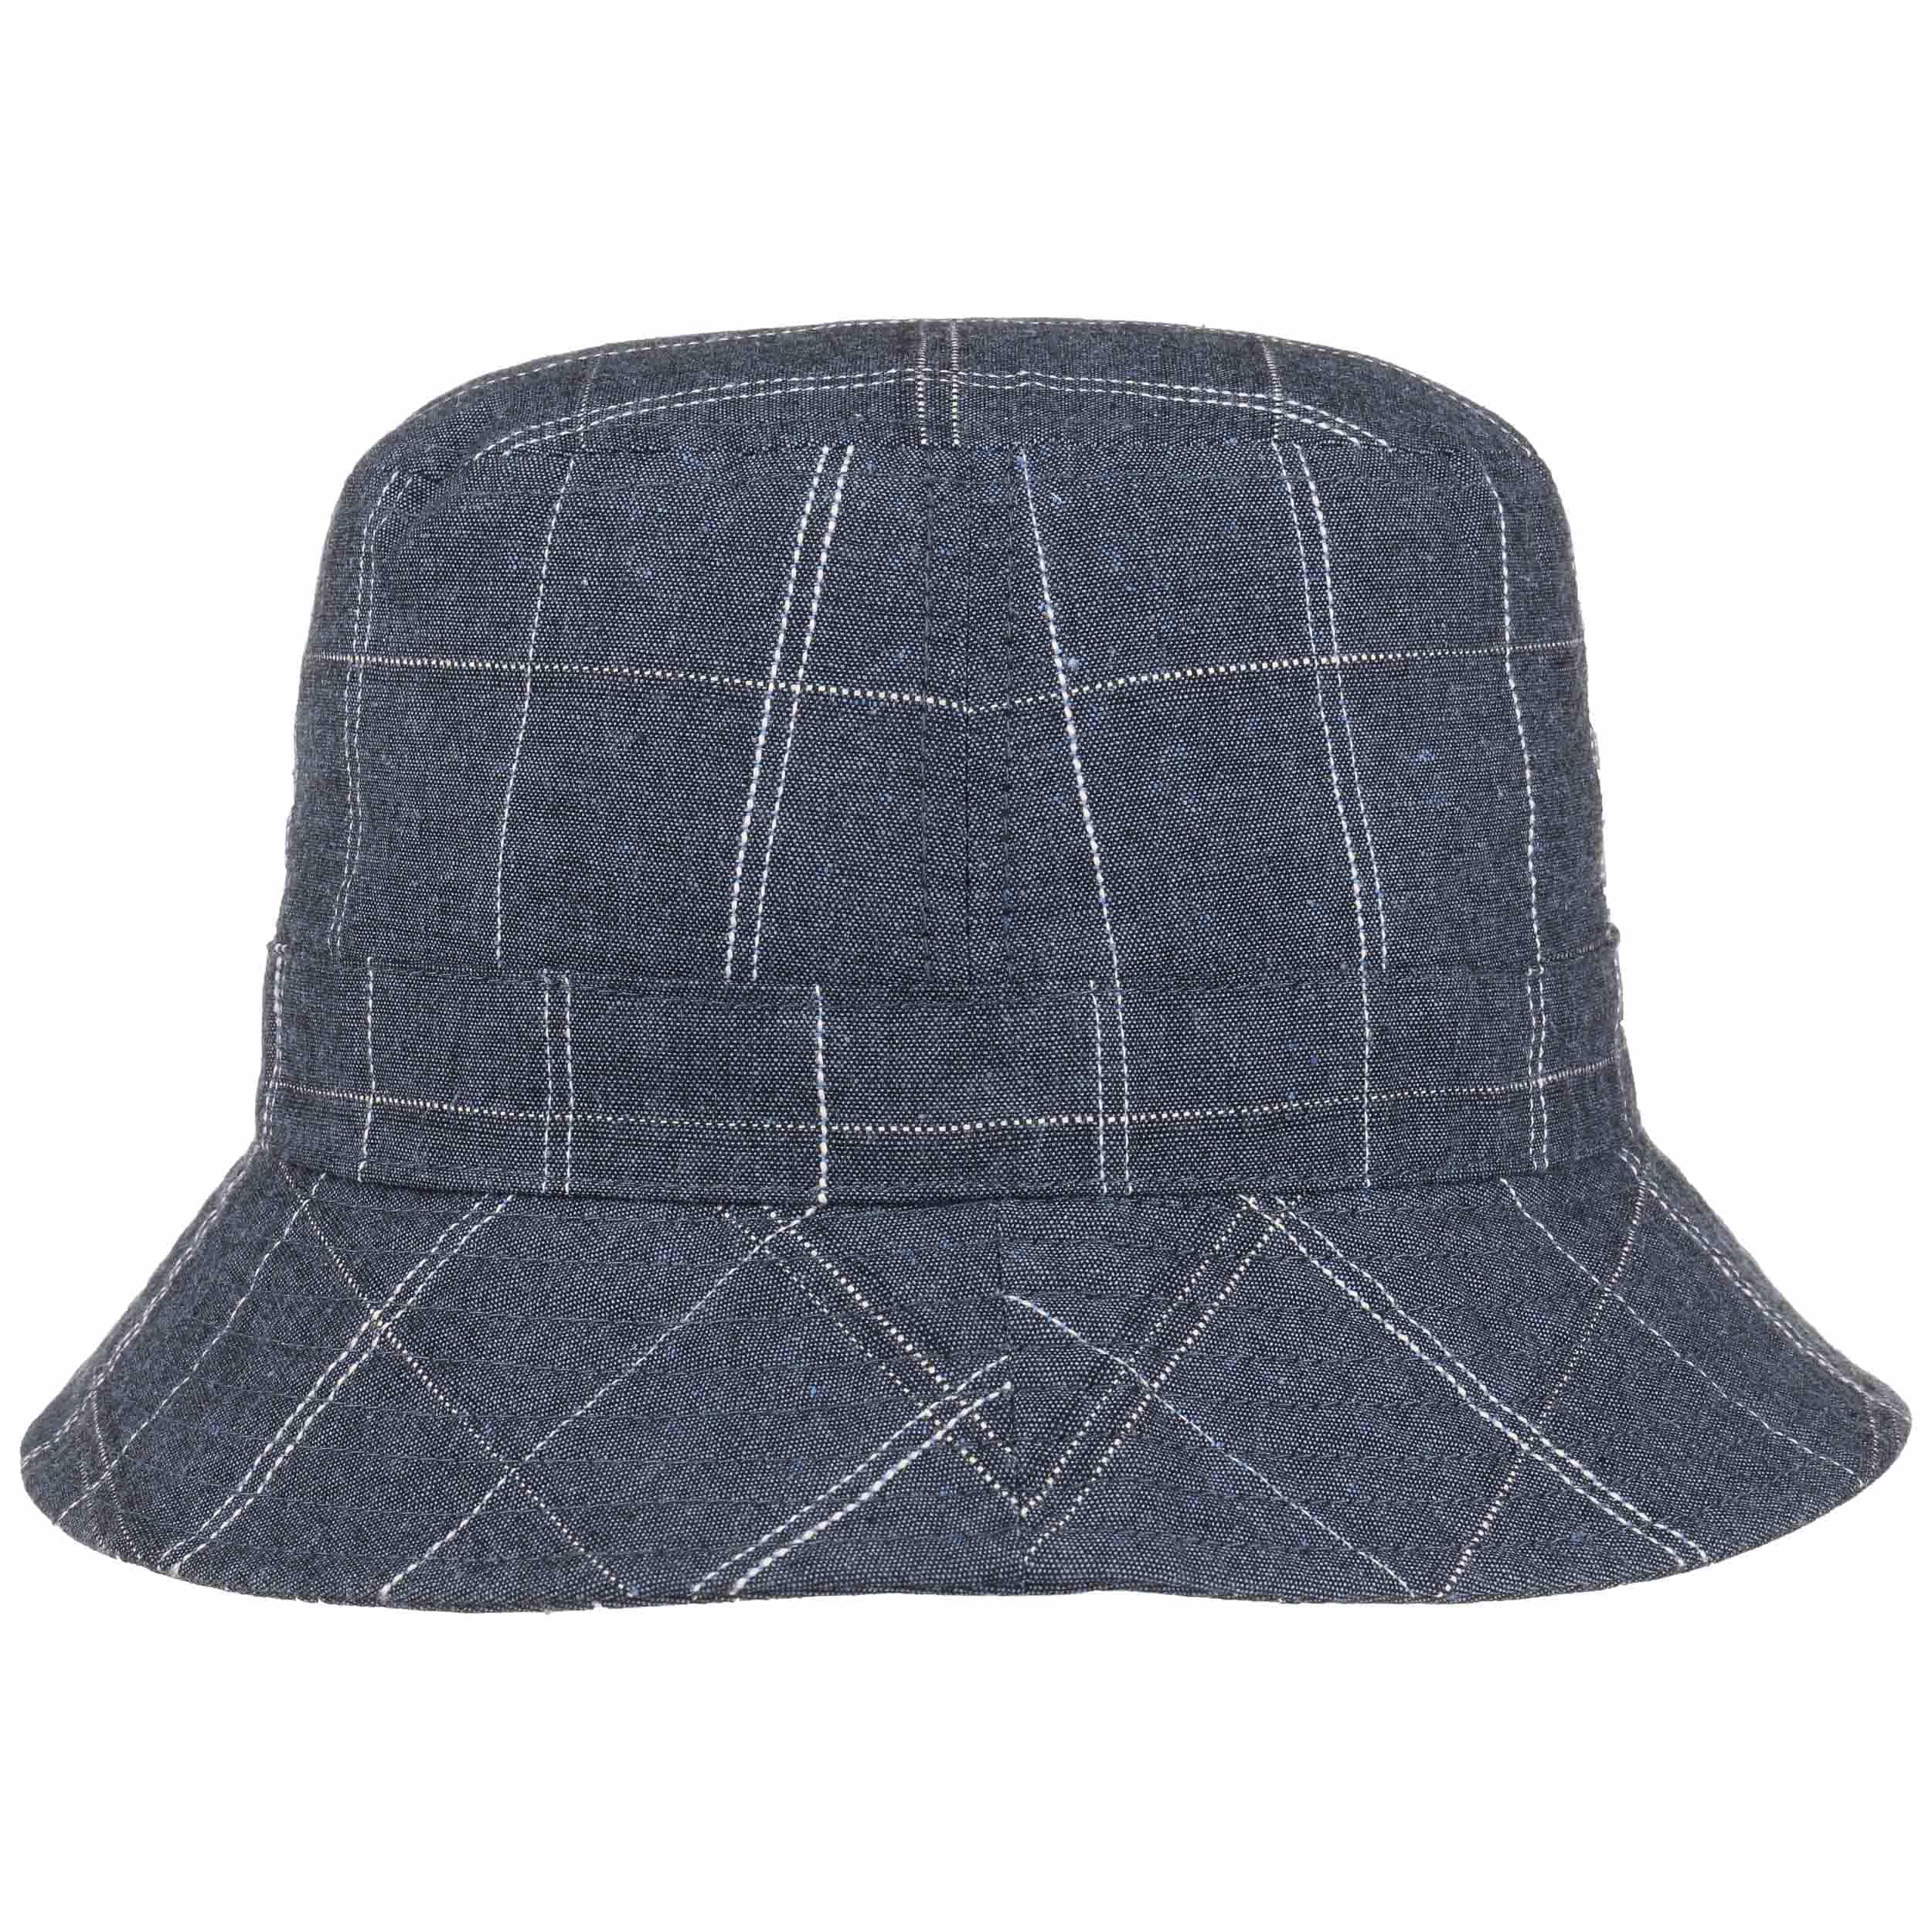 Classic Fedora Panama Hat by Lierys Sun hats Lierys TMAAB